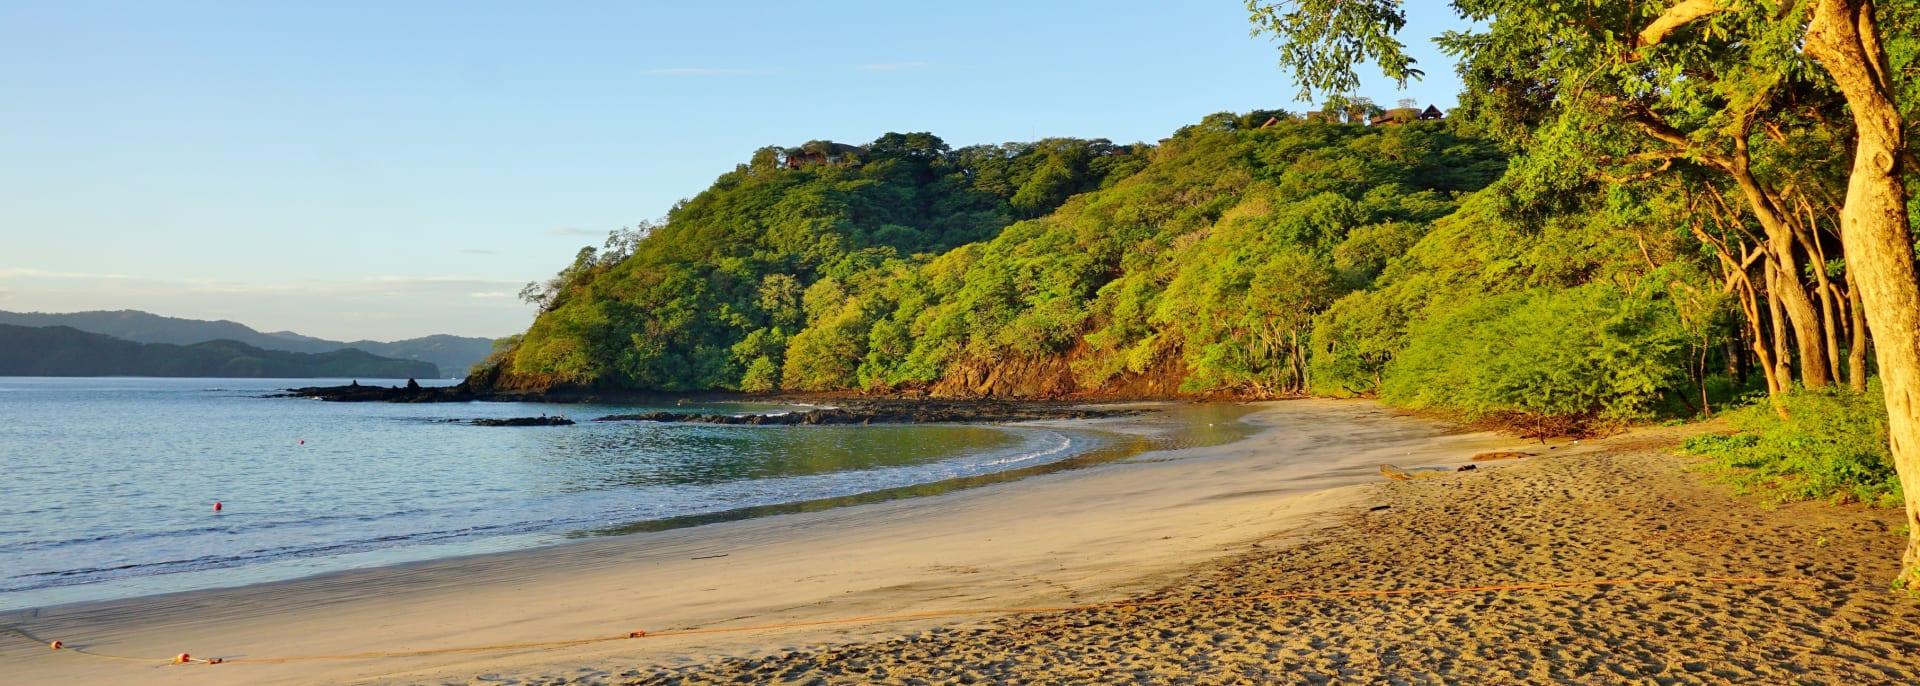 Golfo de Papagayo, Costa Rica